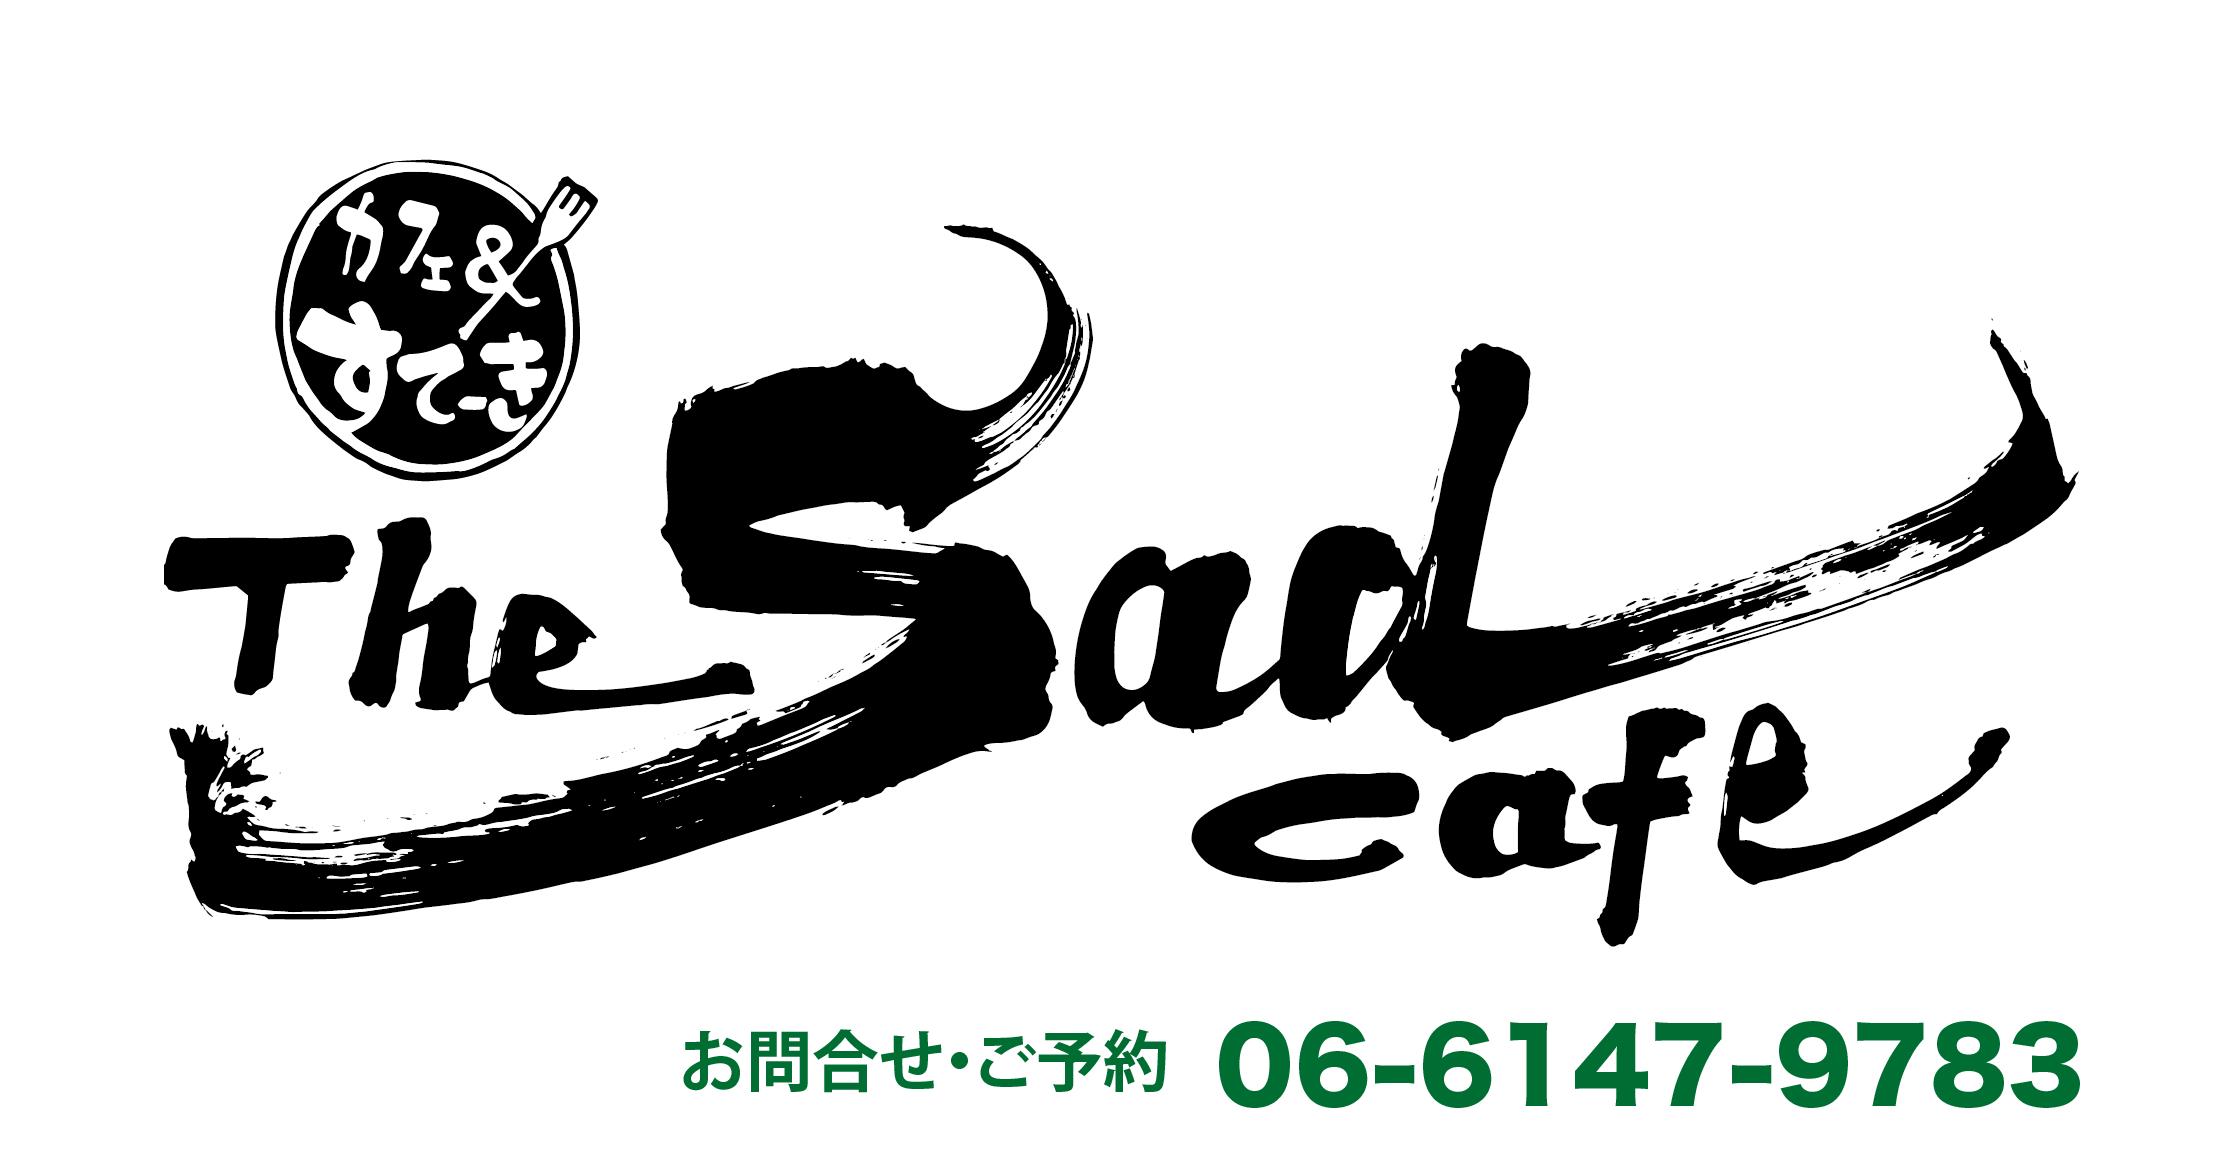 The Sad Cafe/ザ サッド カフェ/大阪野田/ステーキ&カフェ